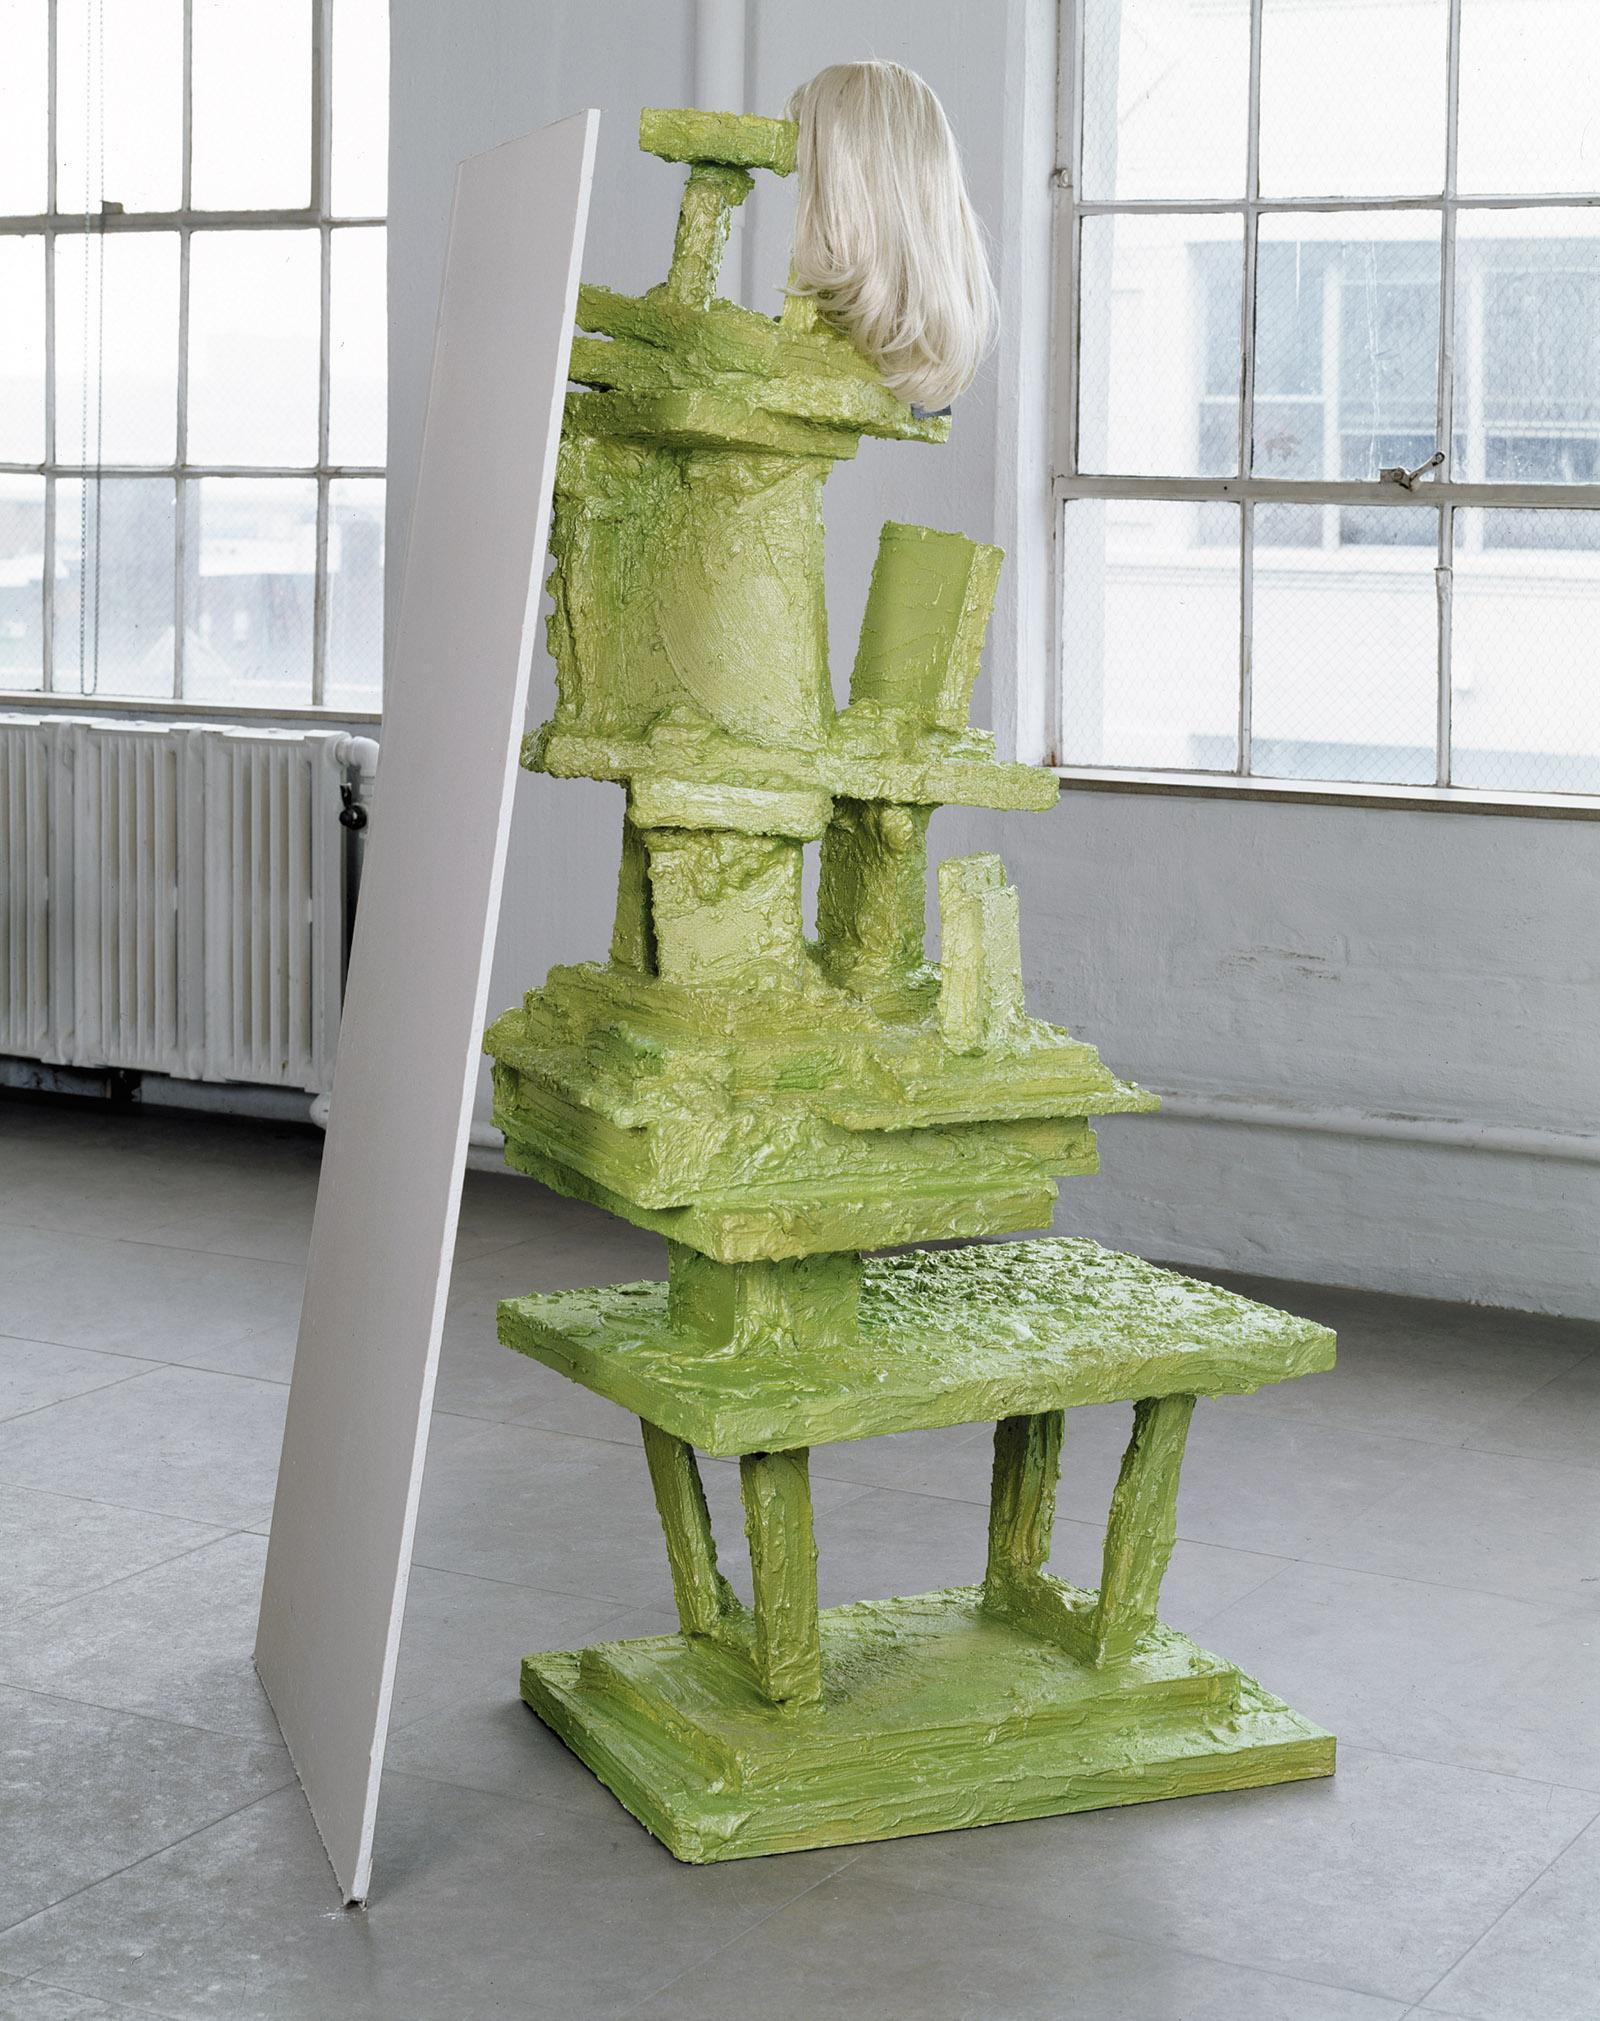 Cindy, 2004; a sculpture by Rachel Harrison